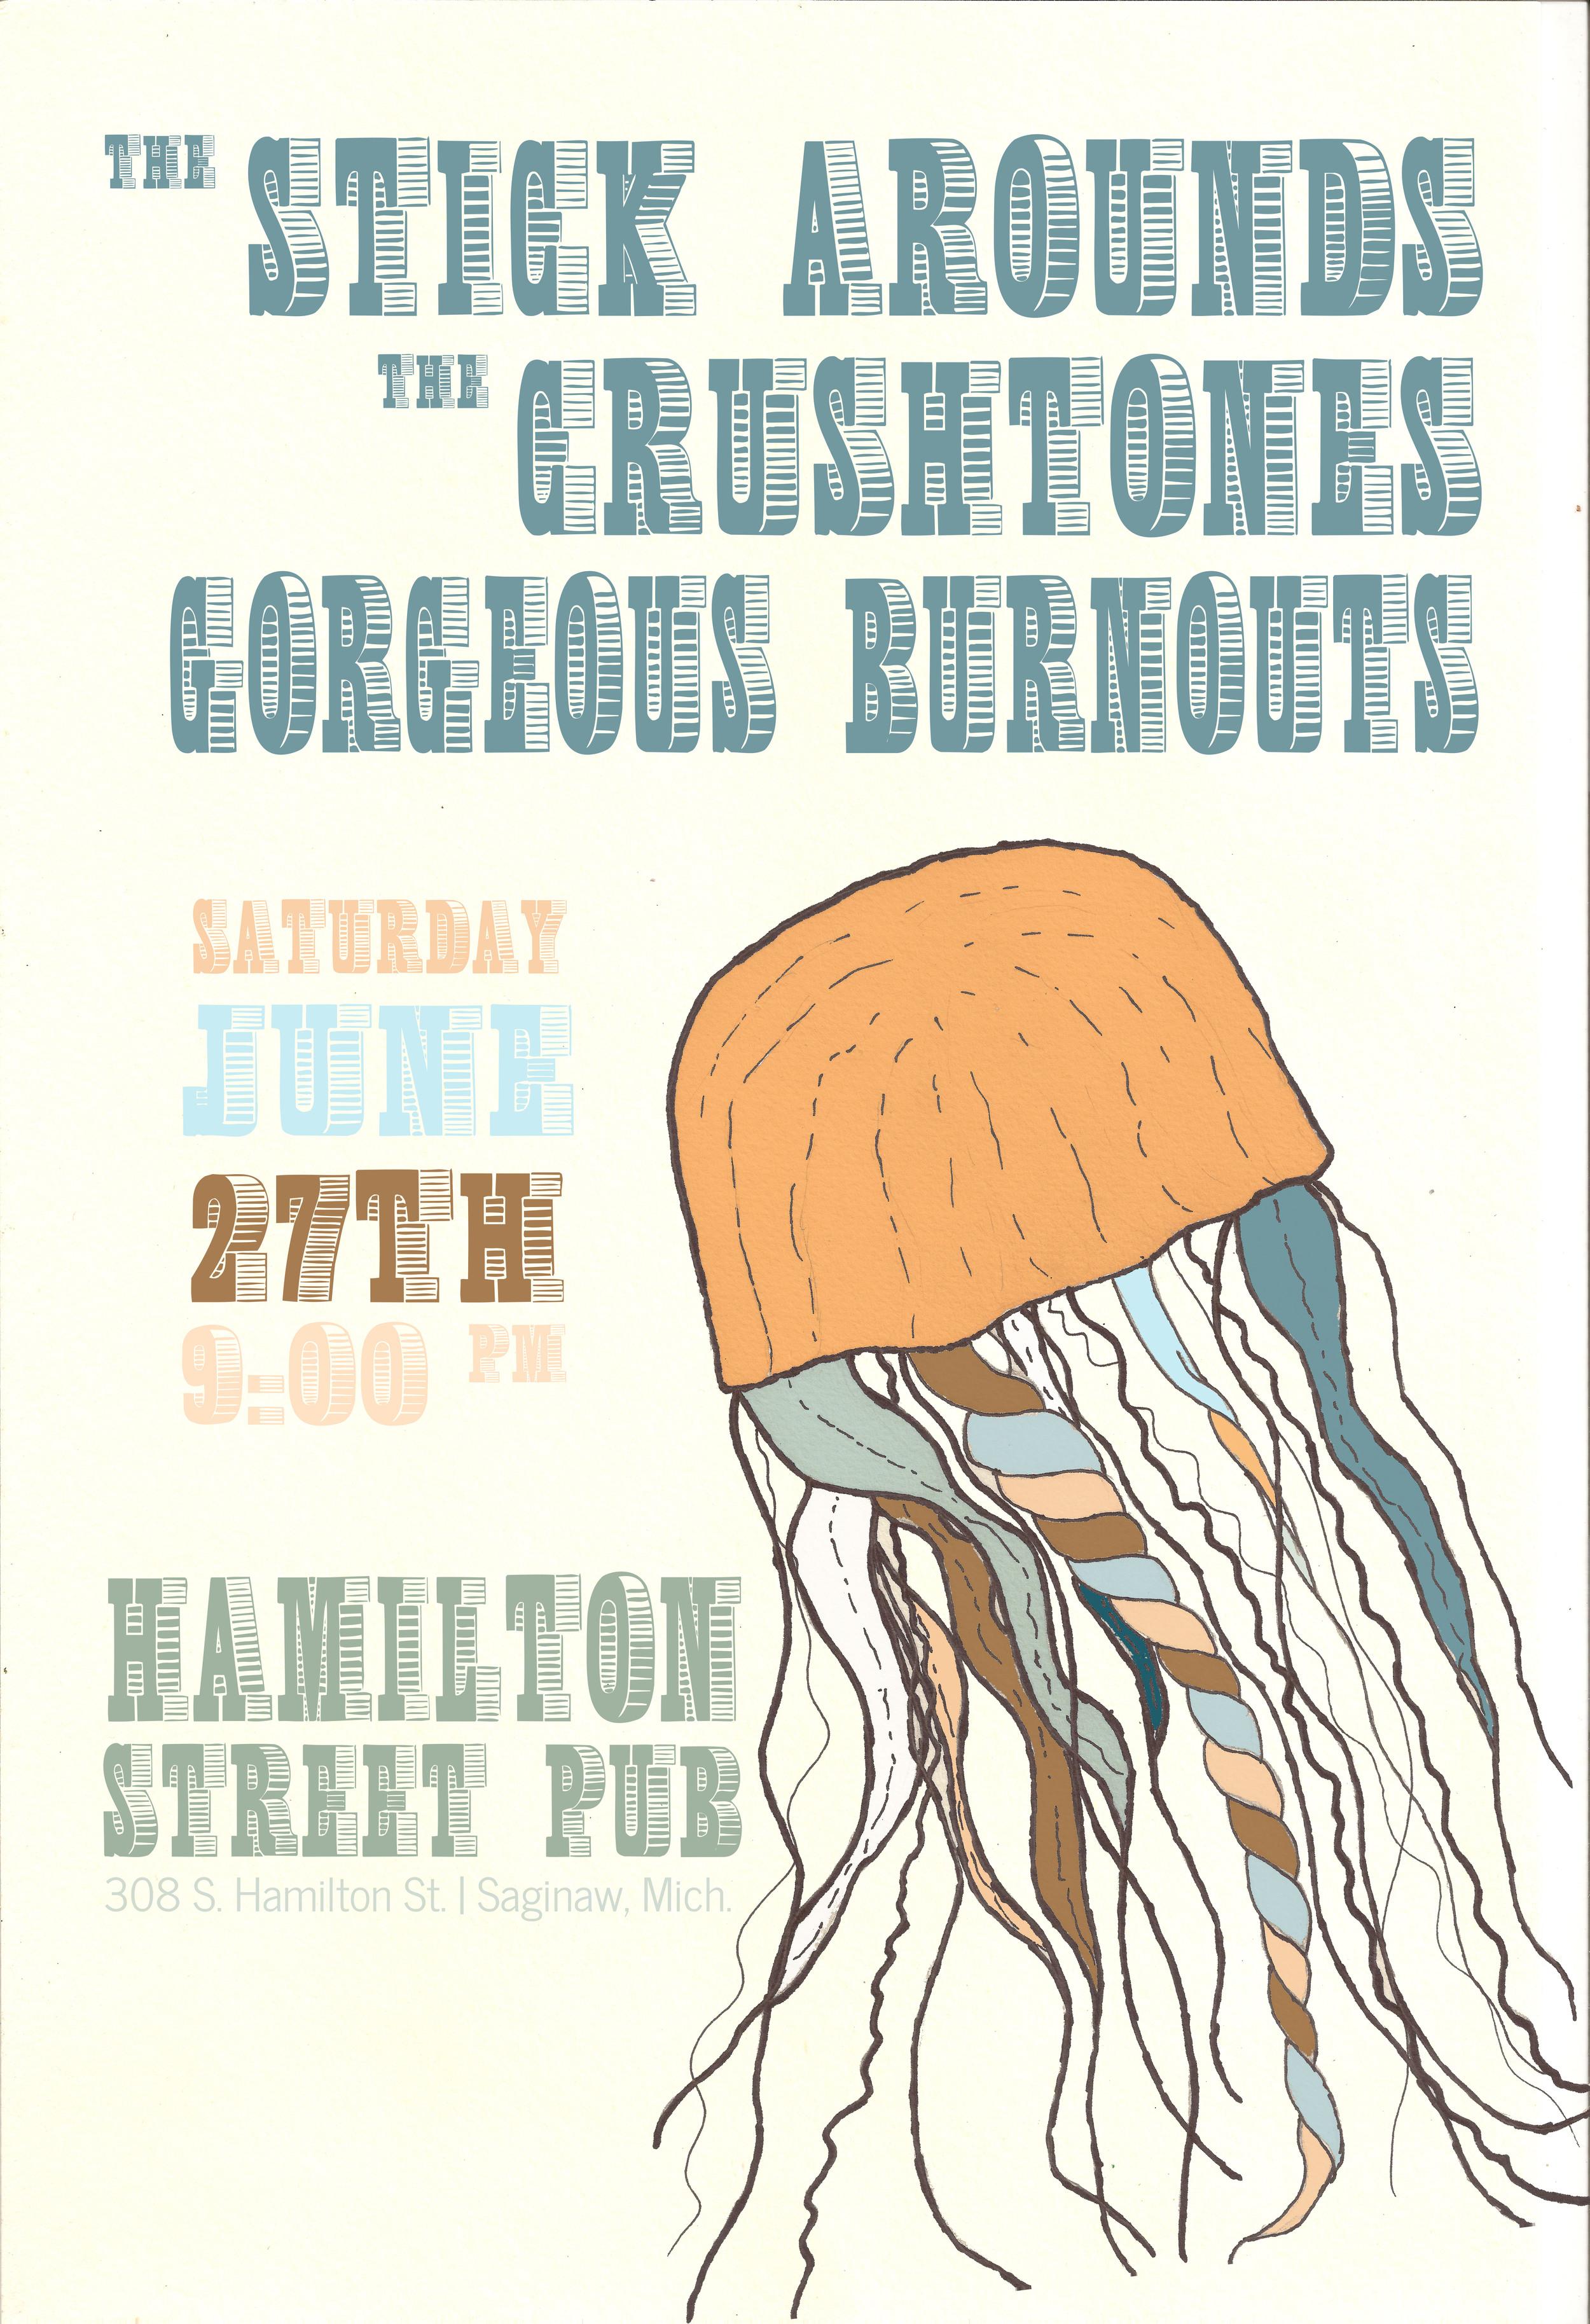 Hamilton Street Pub Poster June 27.jpg